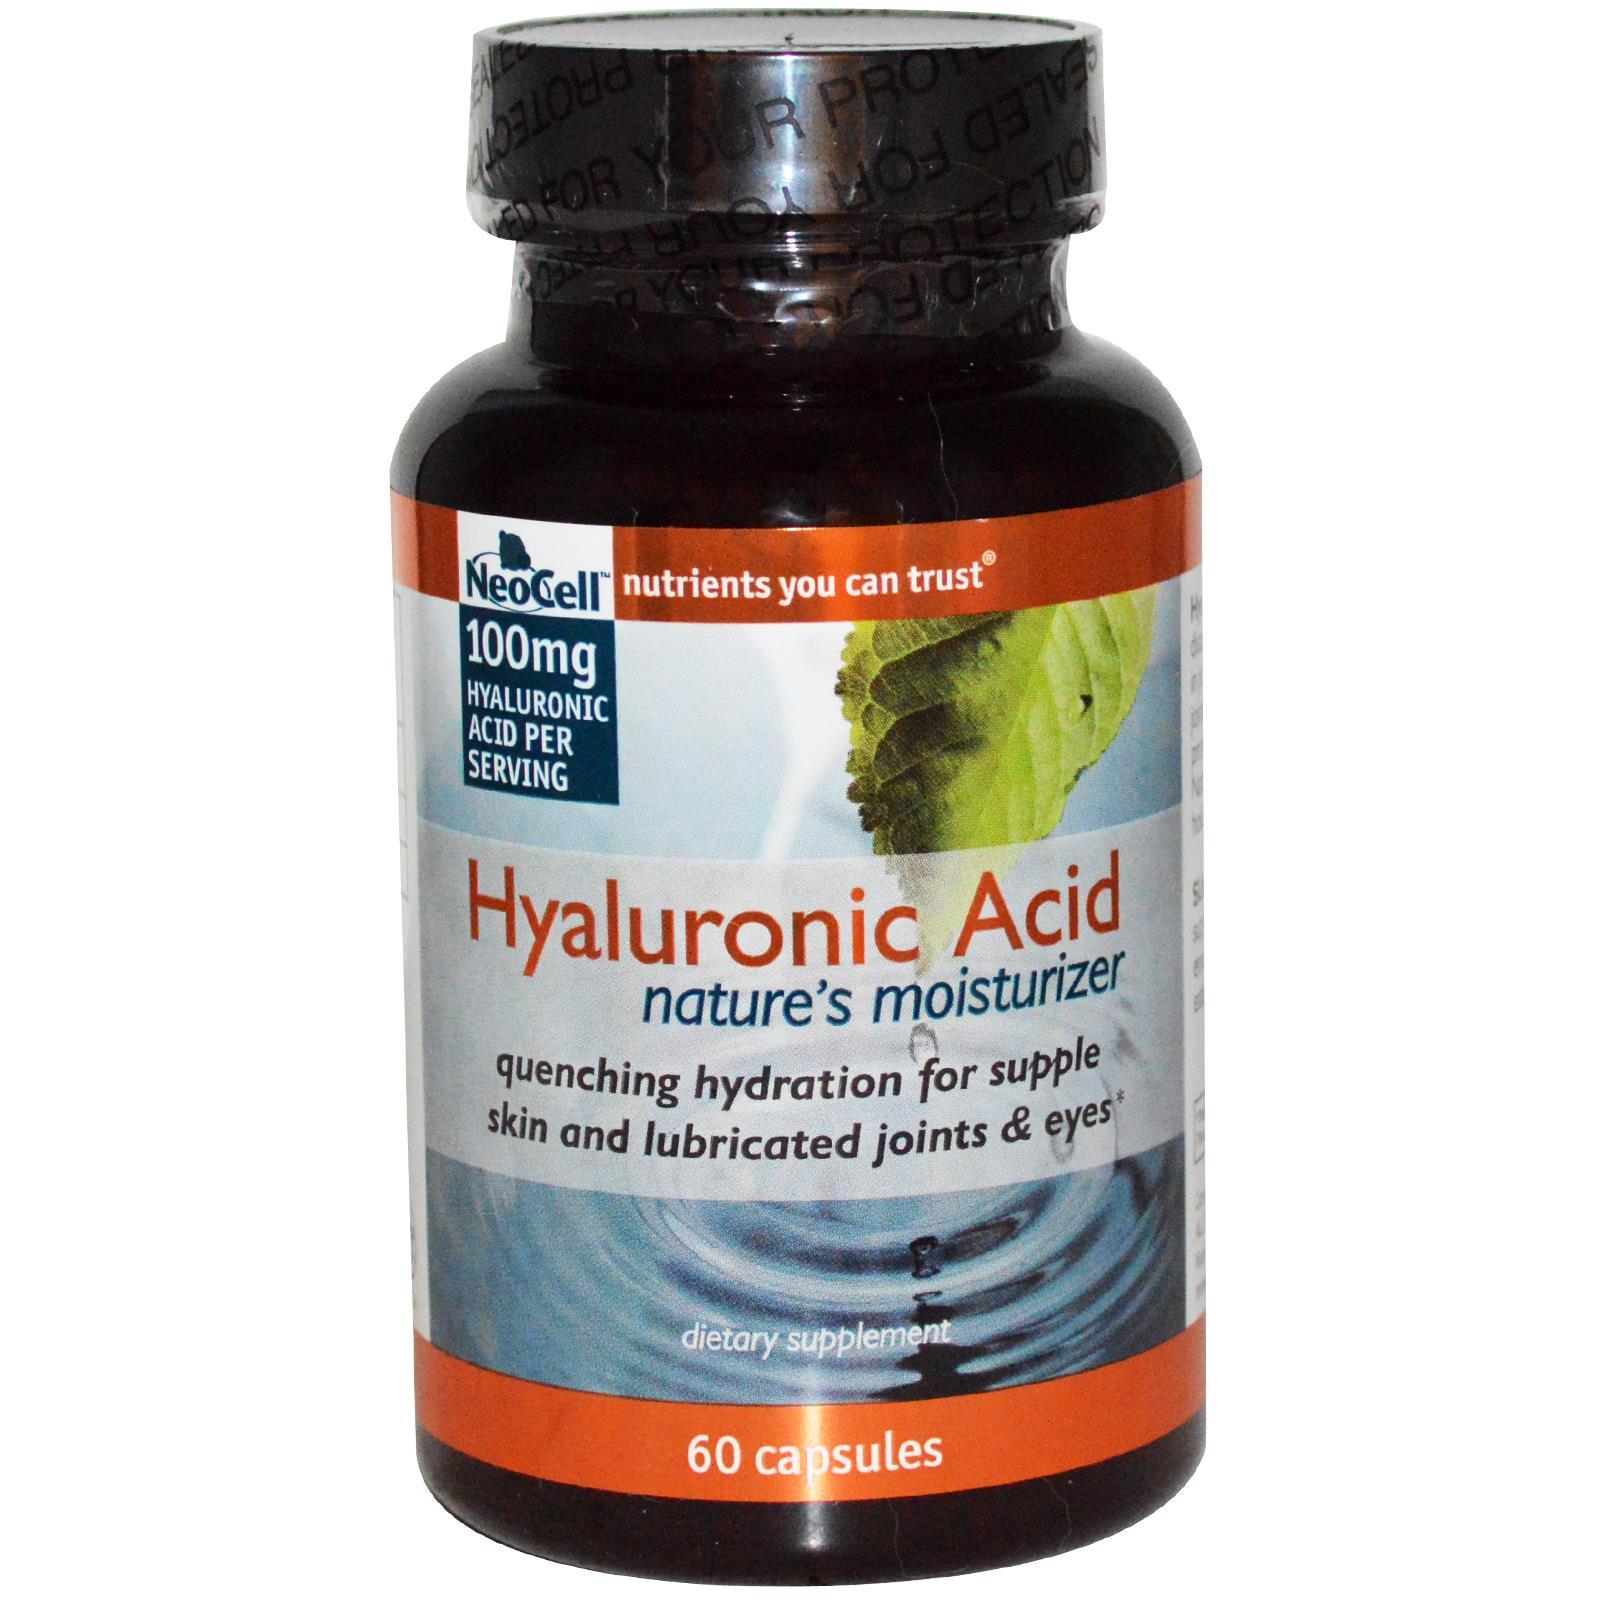 Neocell Hyaluronic acid นีโอเซล ไฮยาลูโรนิก แอซิด บำรุงผิว ริ้วรอยเหี่ยวย่น สายตา